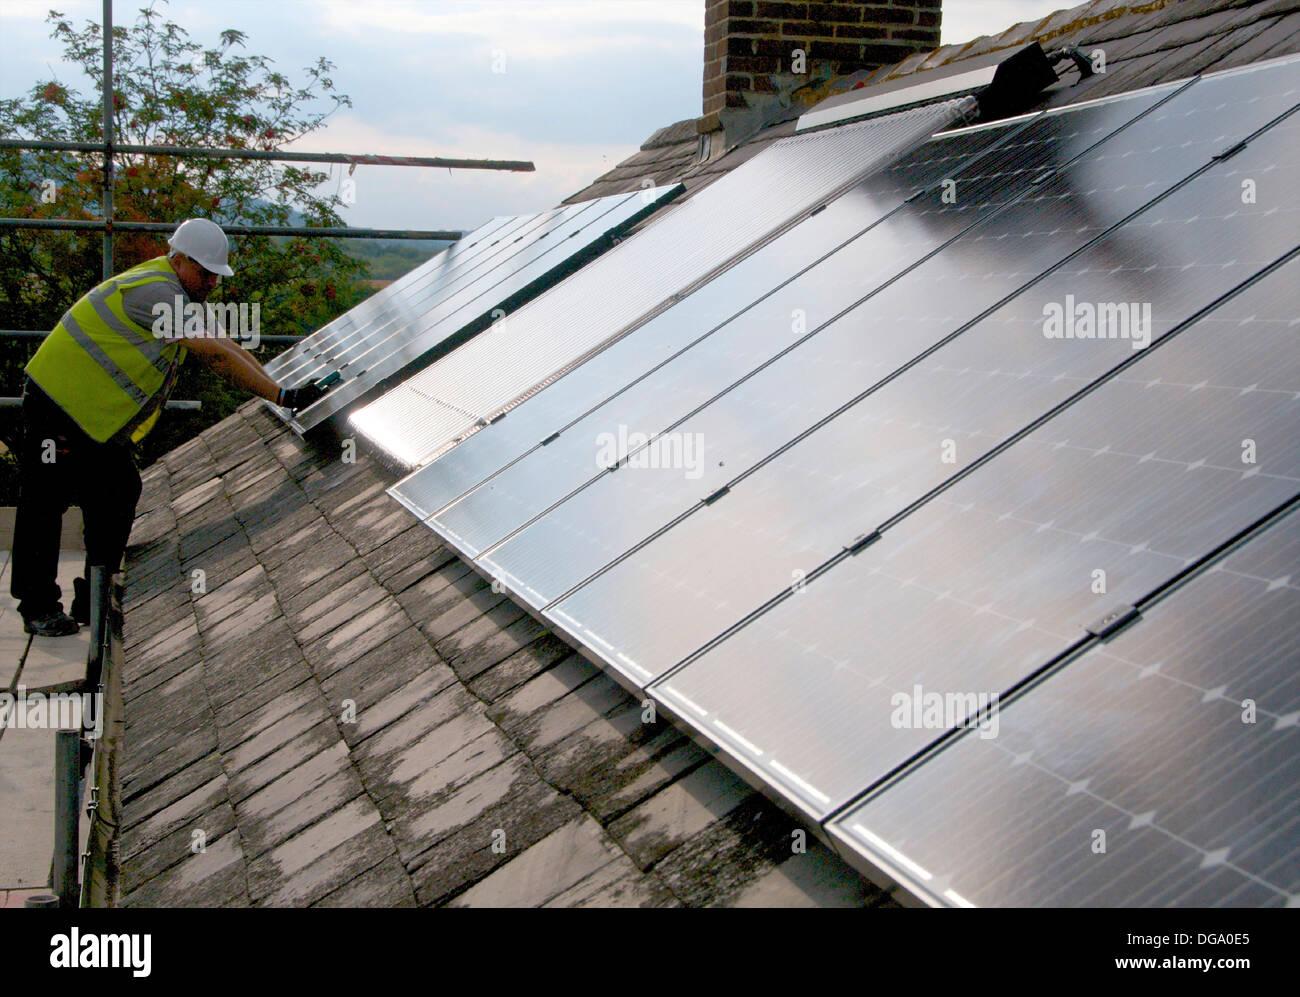 Solar panels photovoltaic generate electrcity - Stock Image